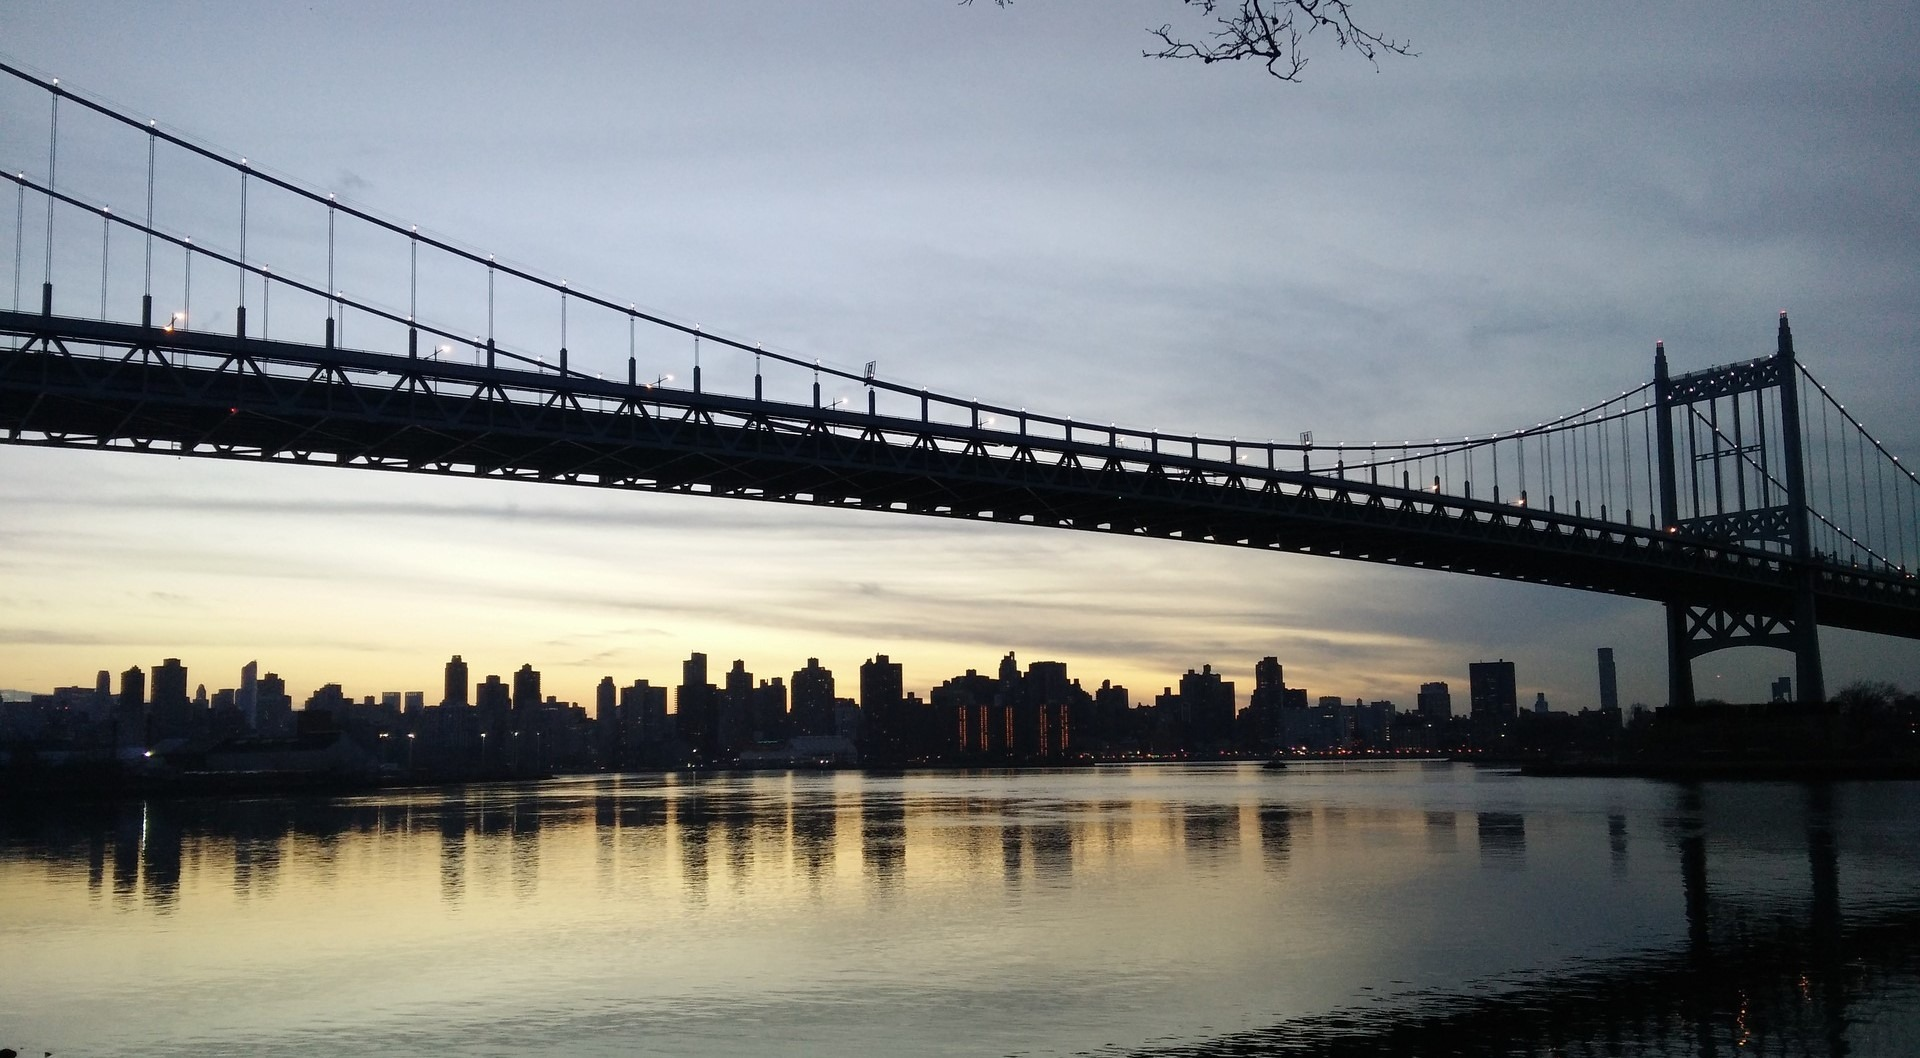 Bridge in Astoria New York - GoodwillCarDonation.org